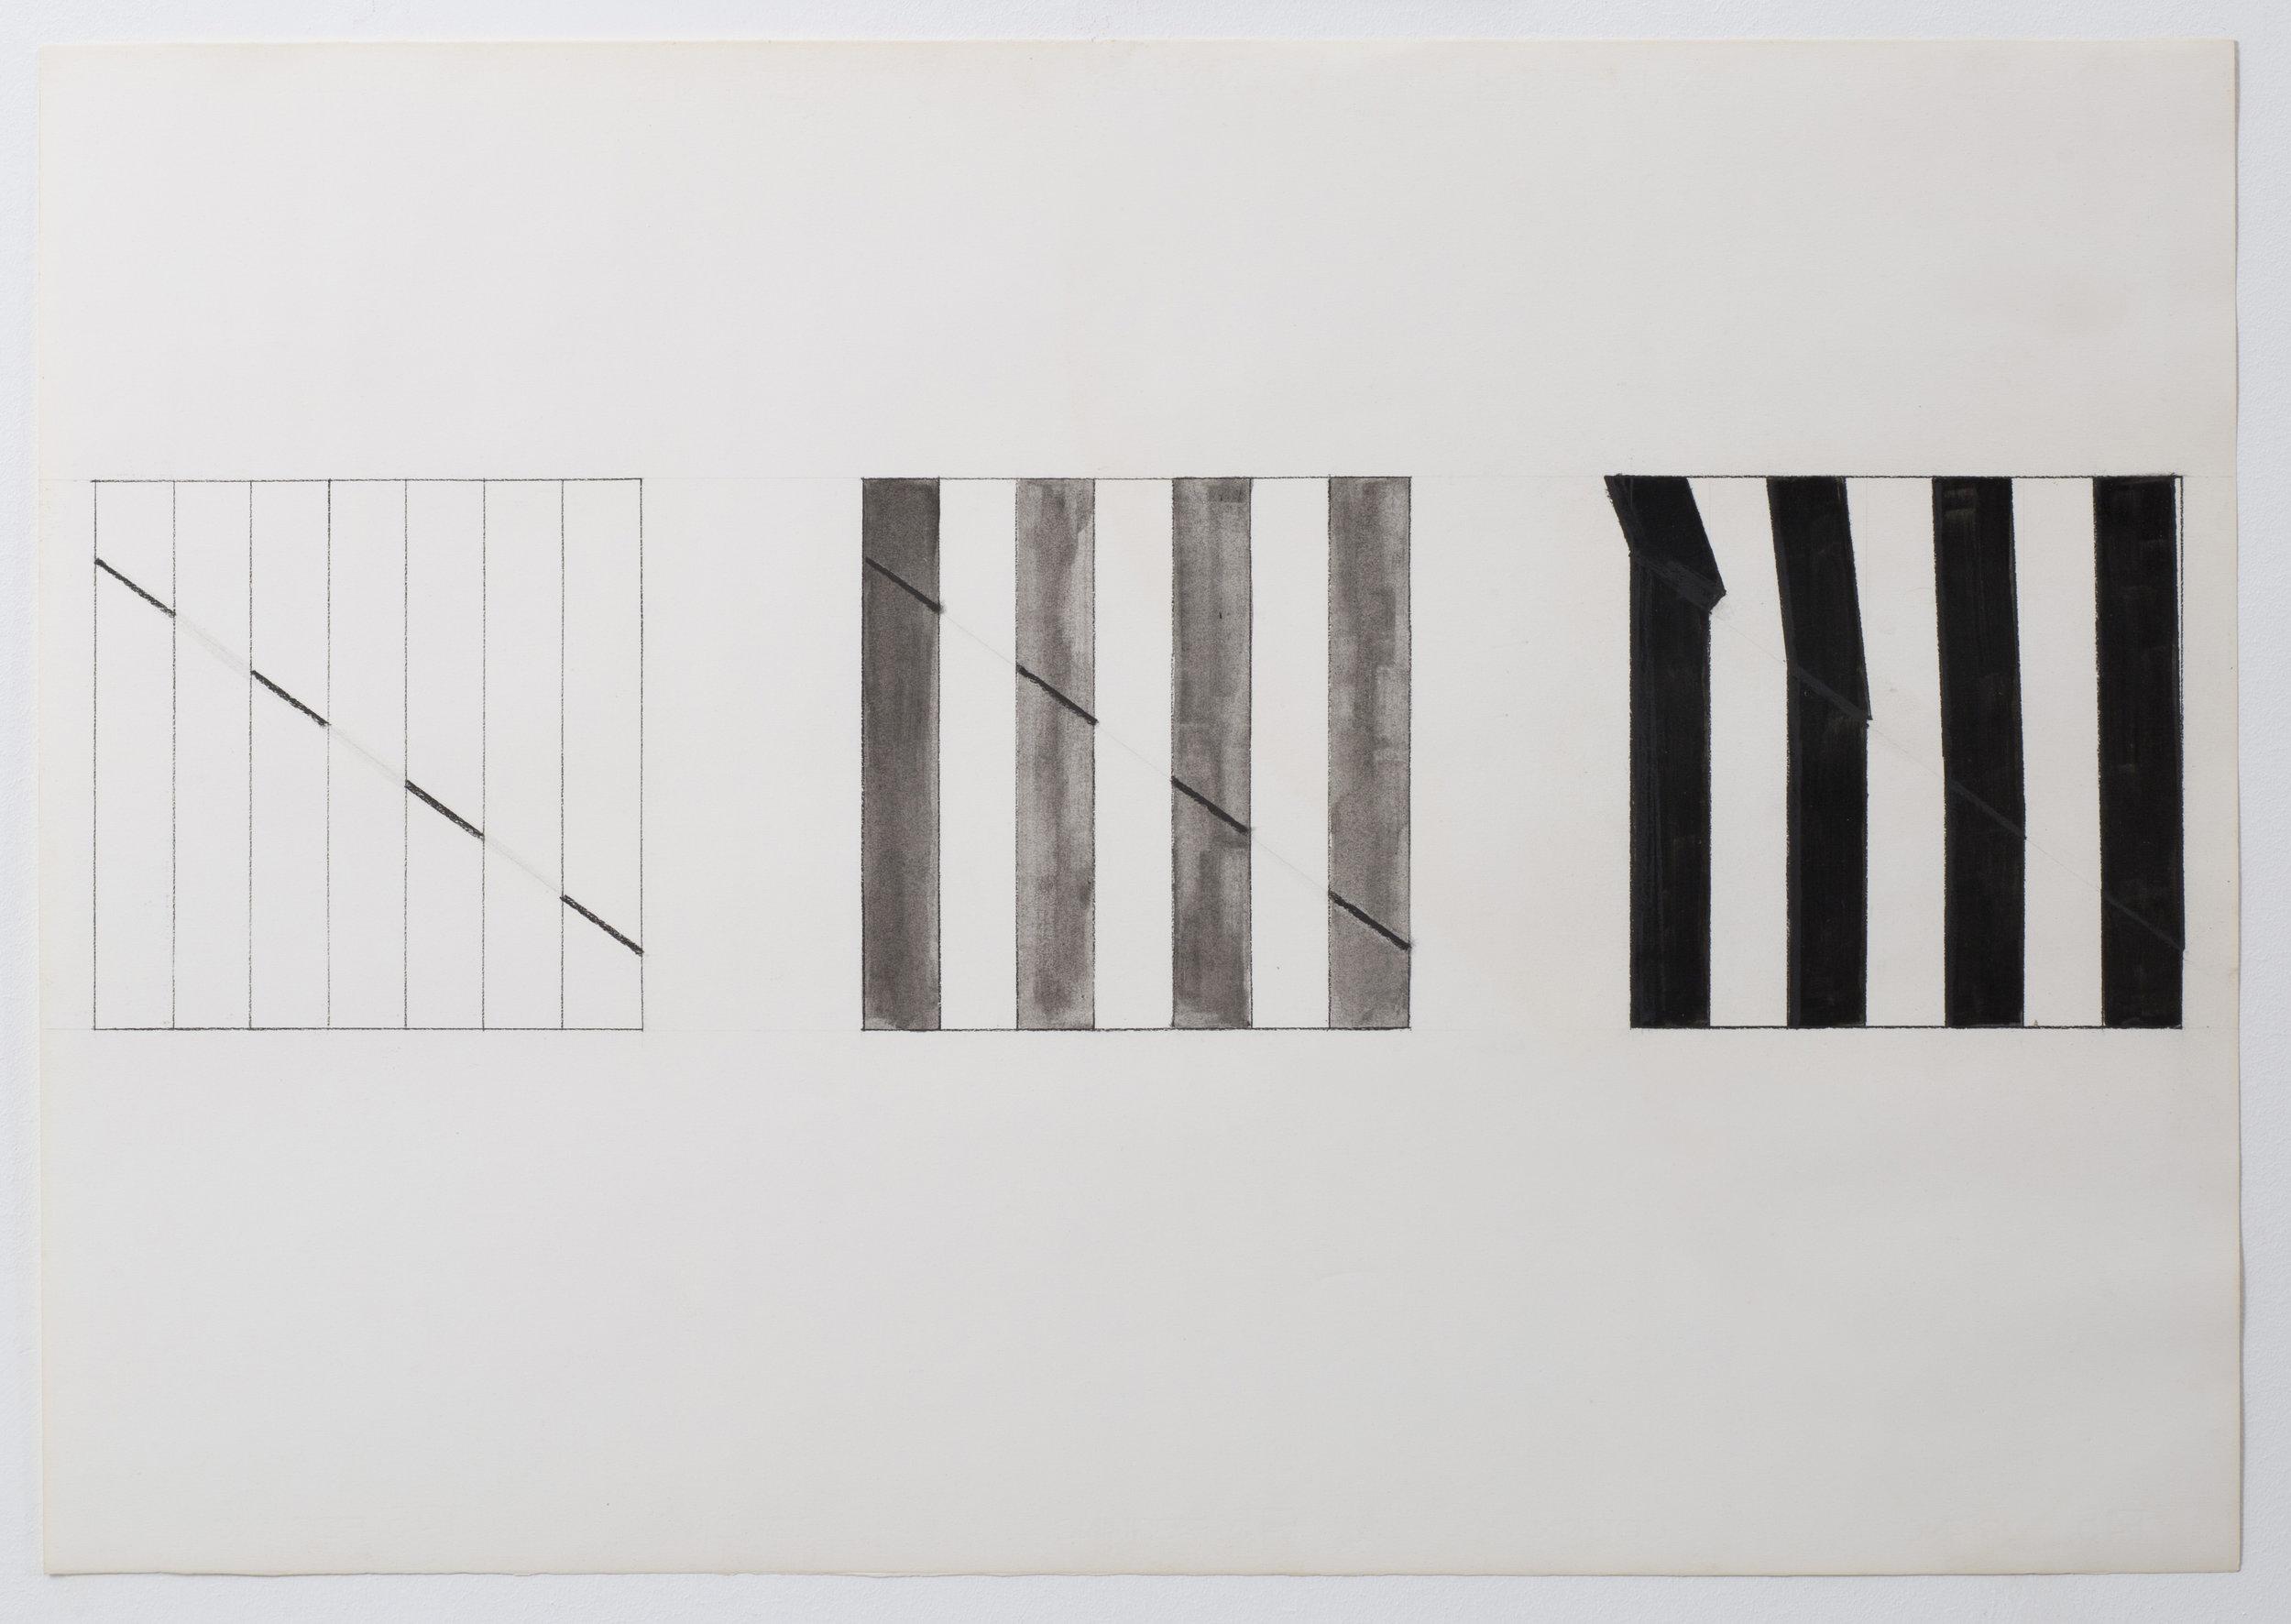 Studio per diagonale - 1975